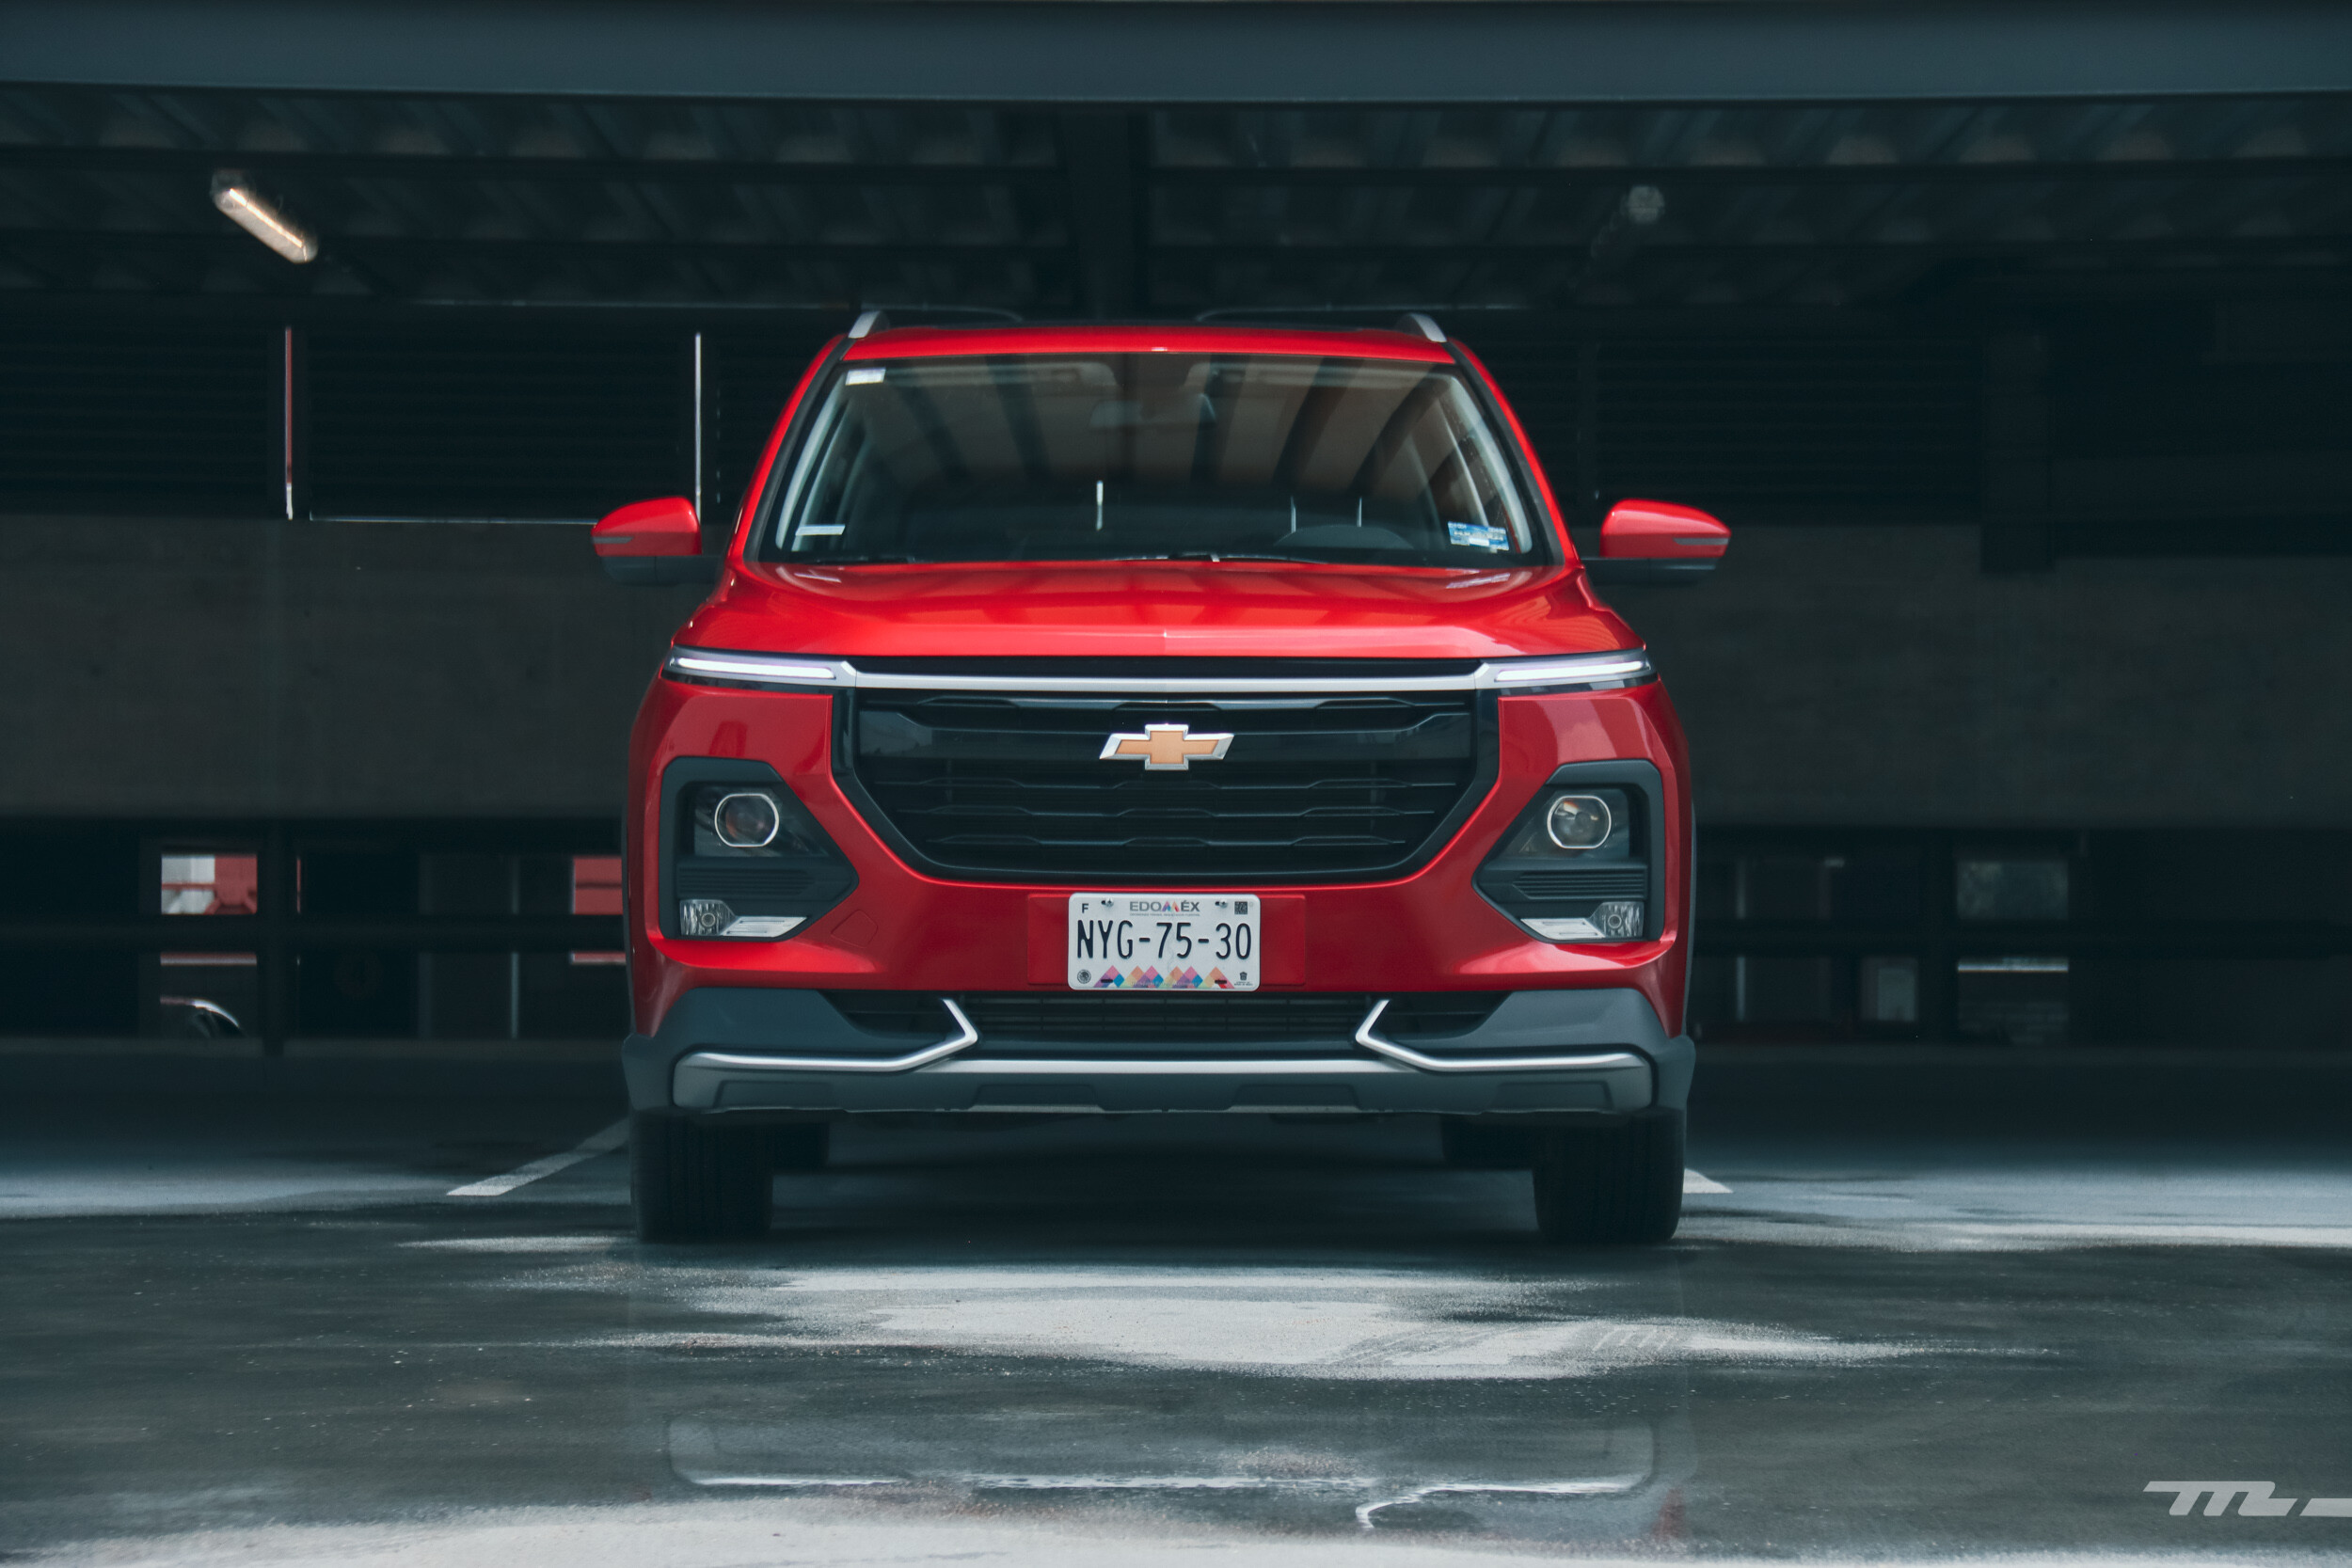 Foto de Chevrolet Captiva 2022 (52/54)